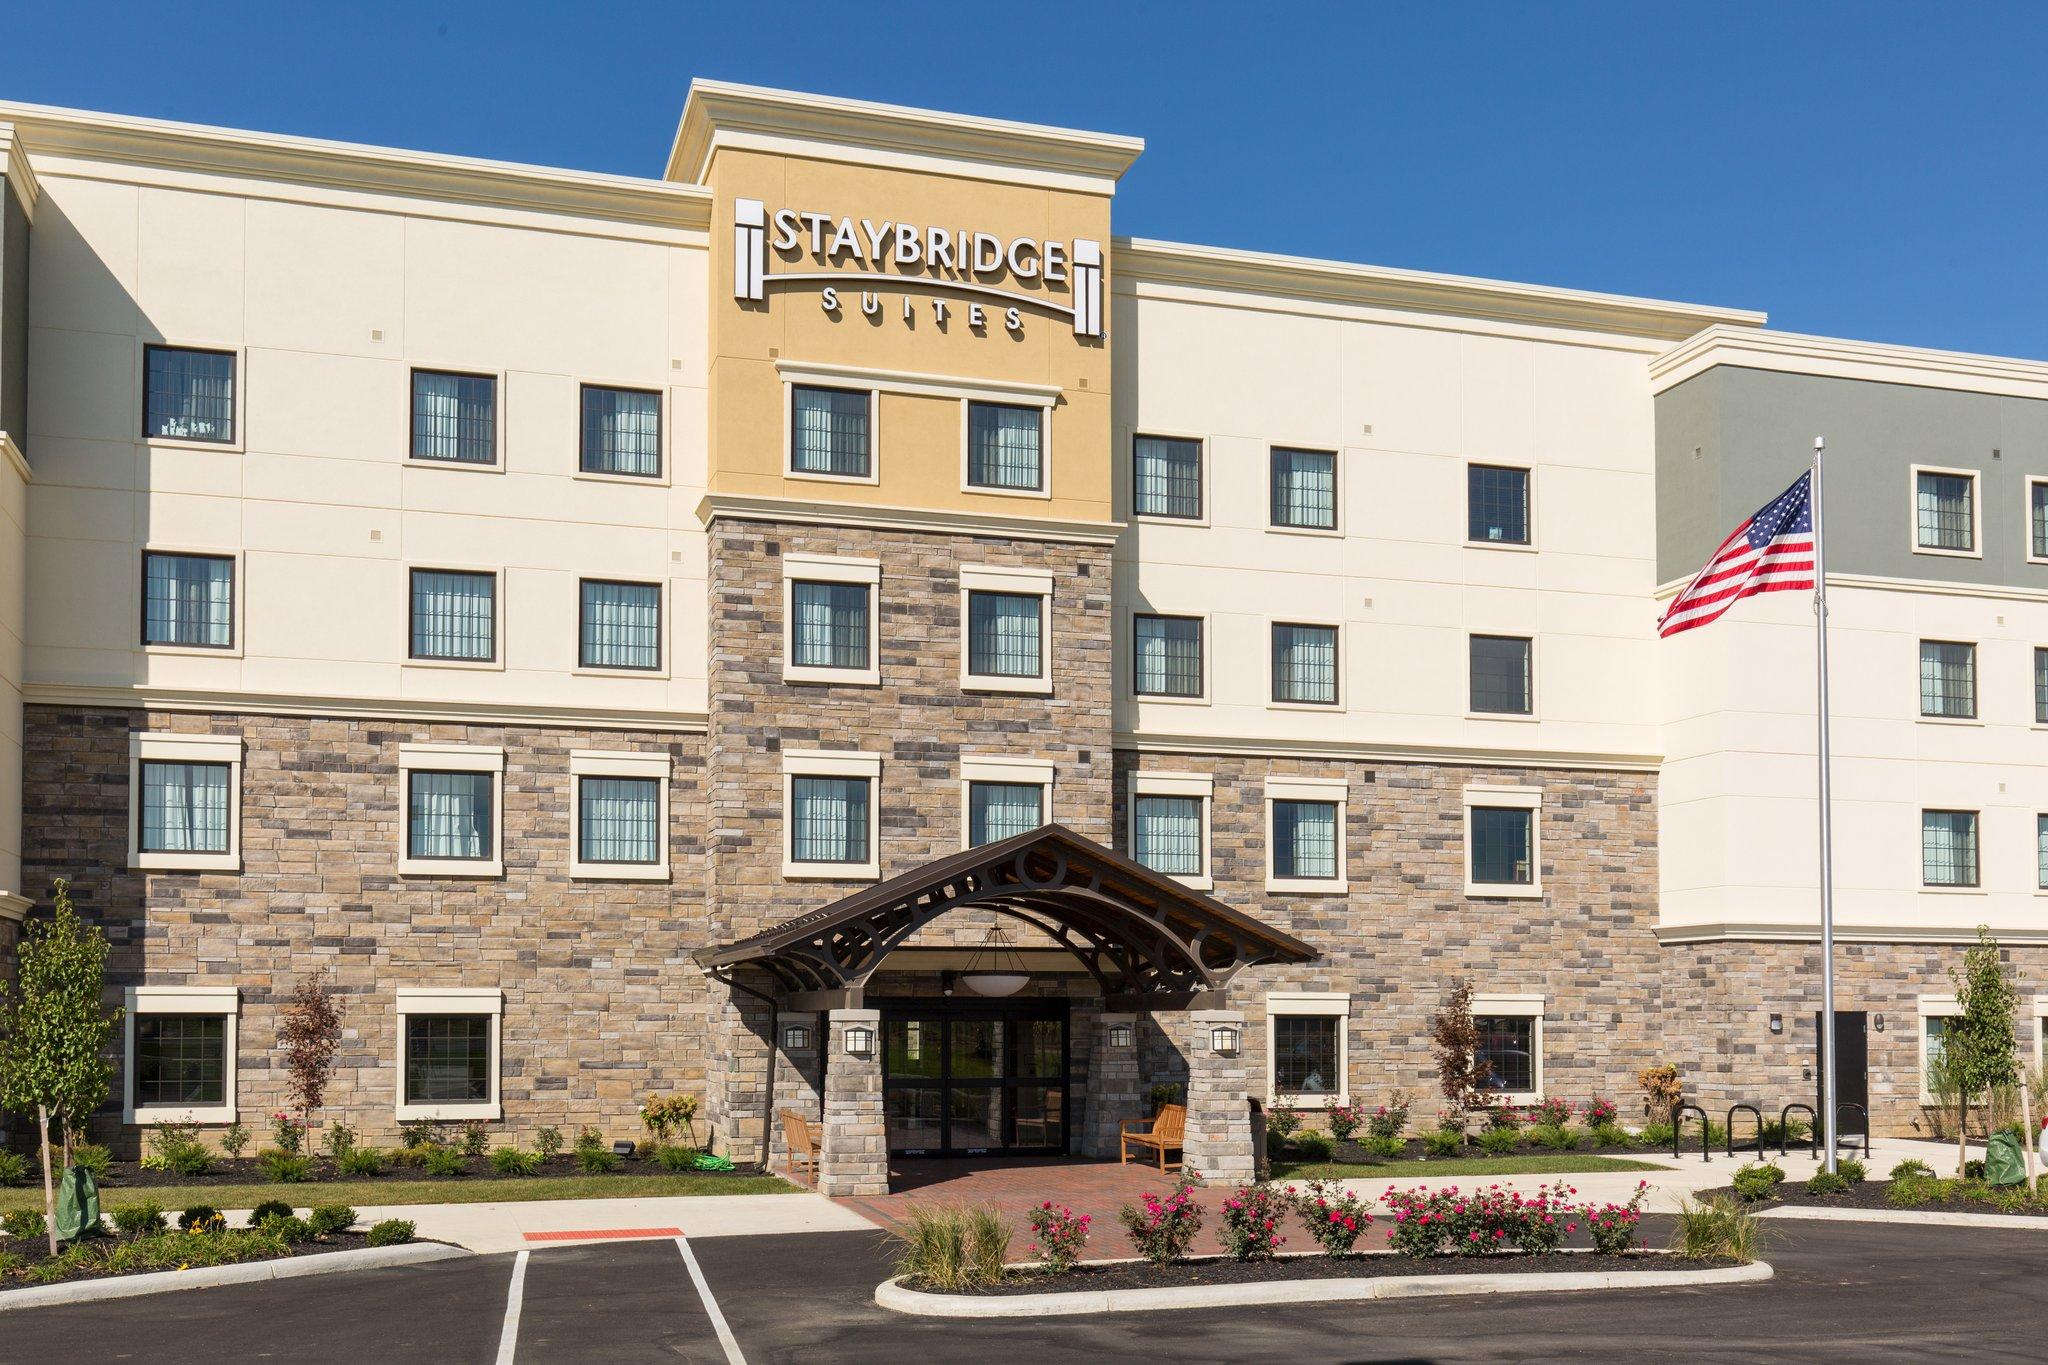 Staybridge Suites Columbus